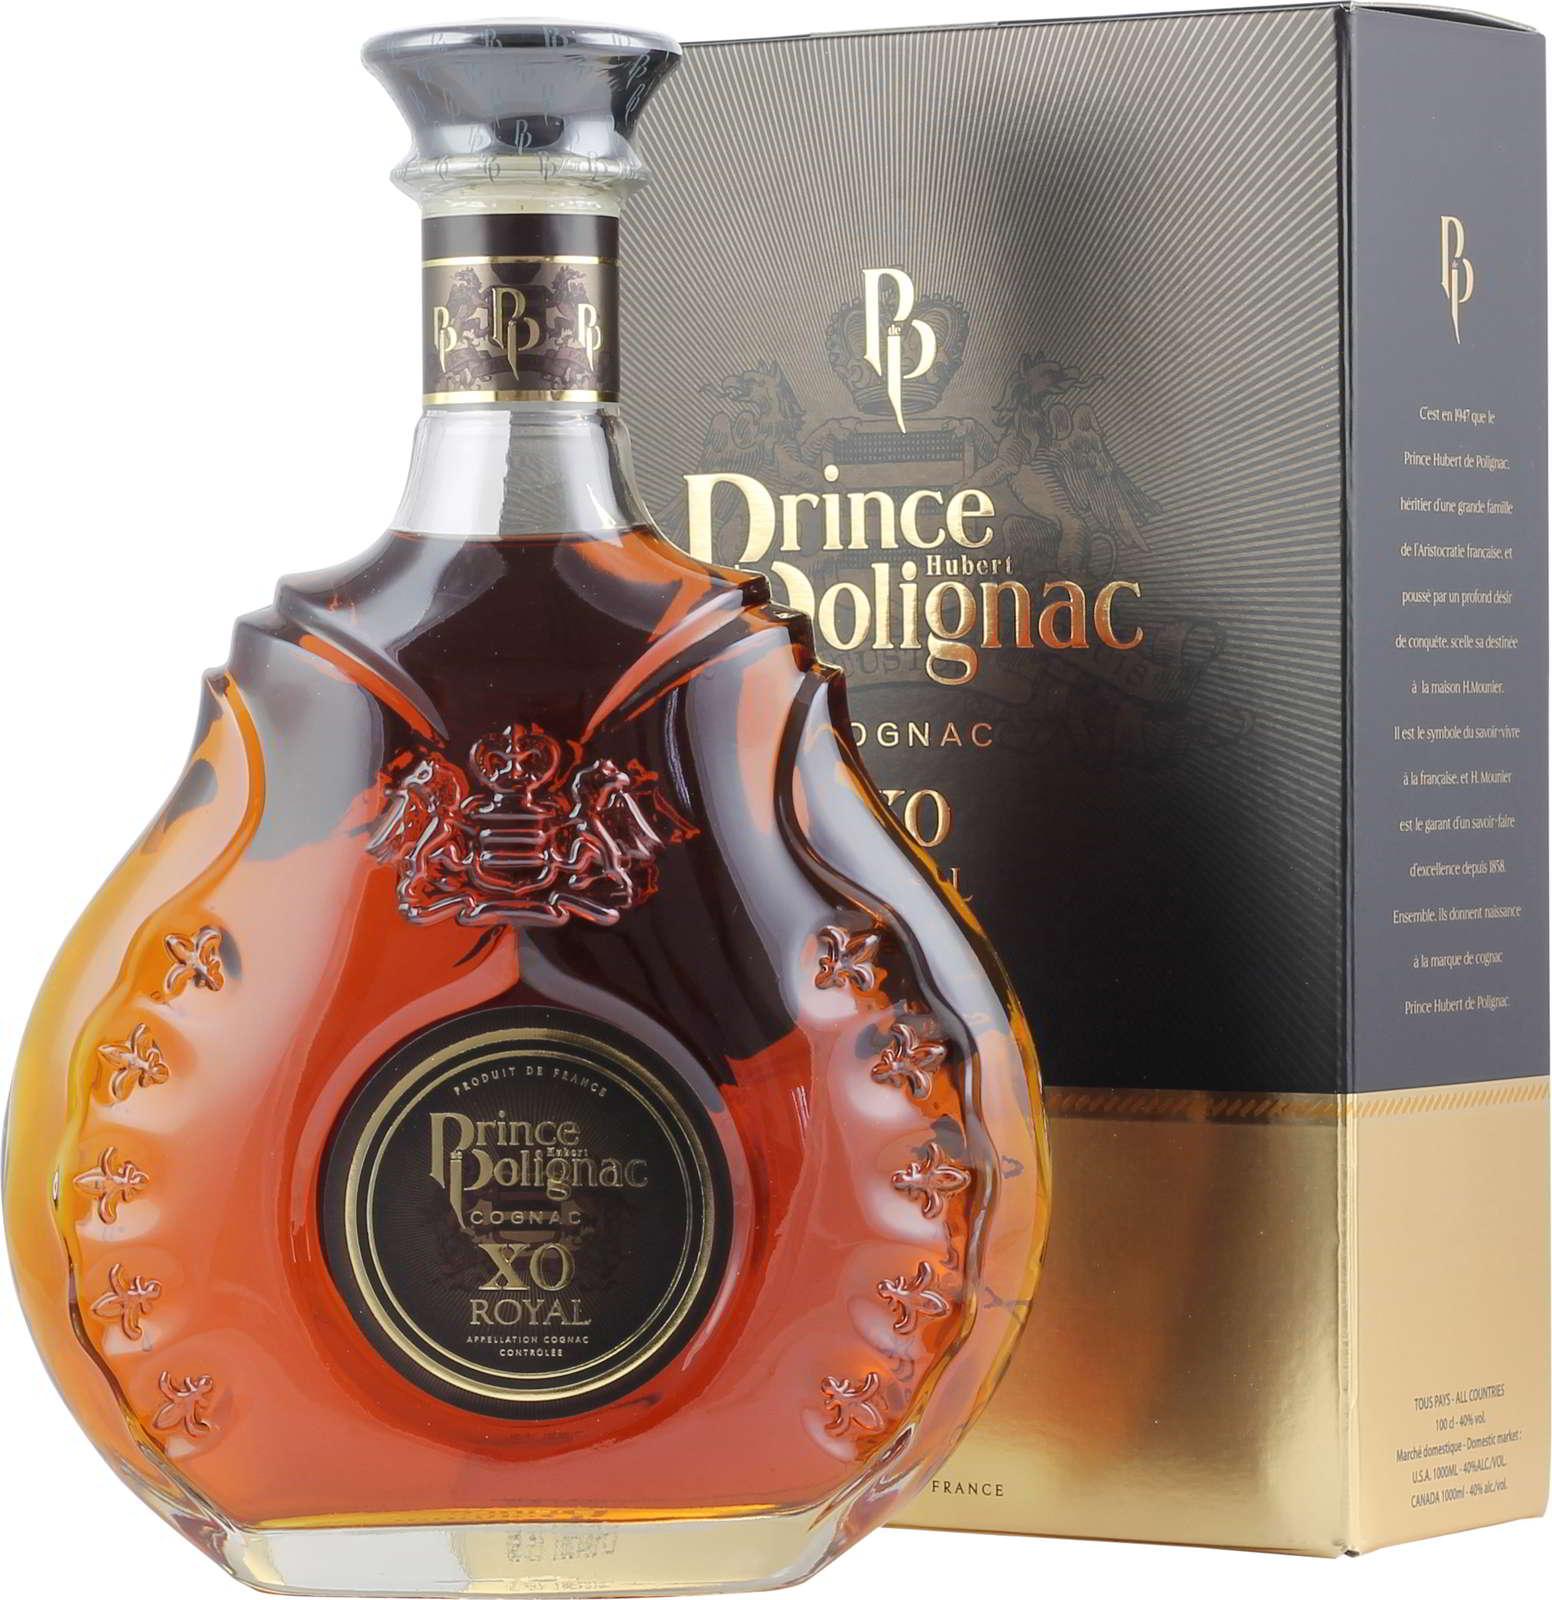 Polignac Cognac XO Royal GP 1 Liter 40 % Vol.